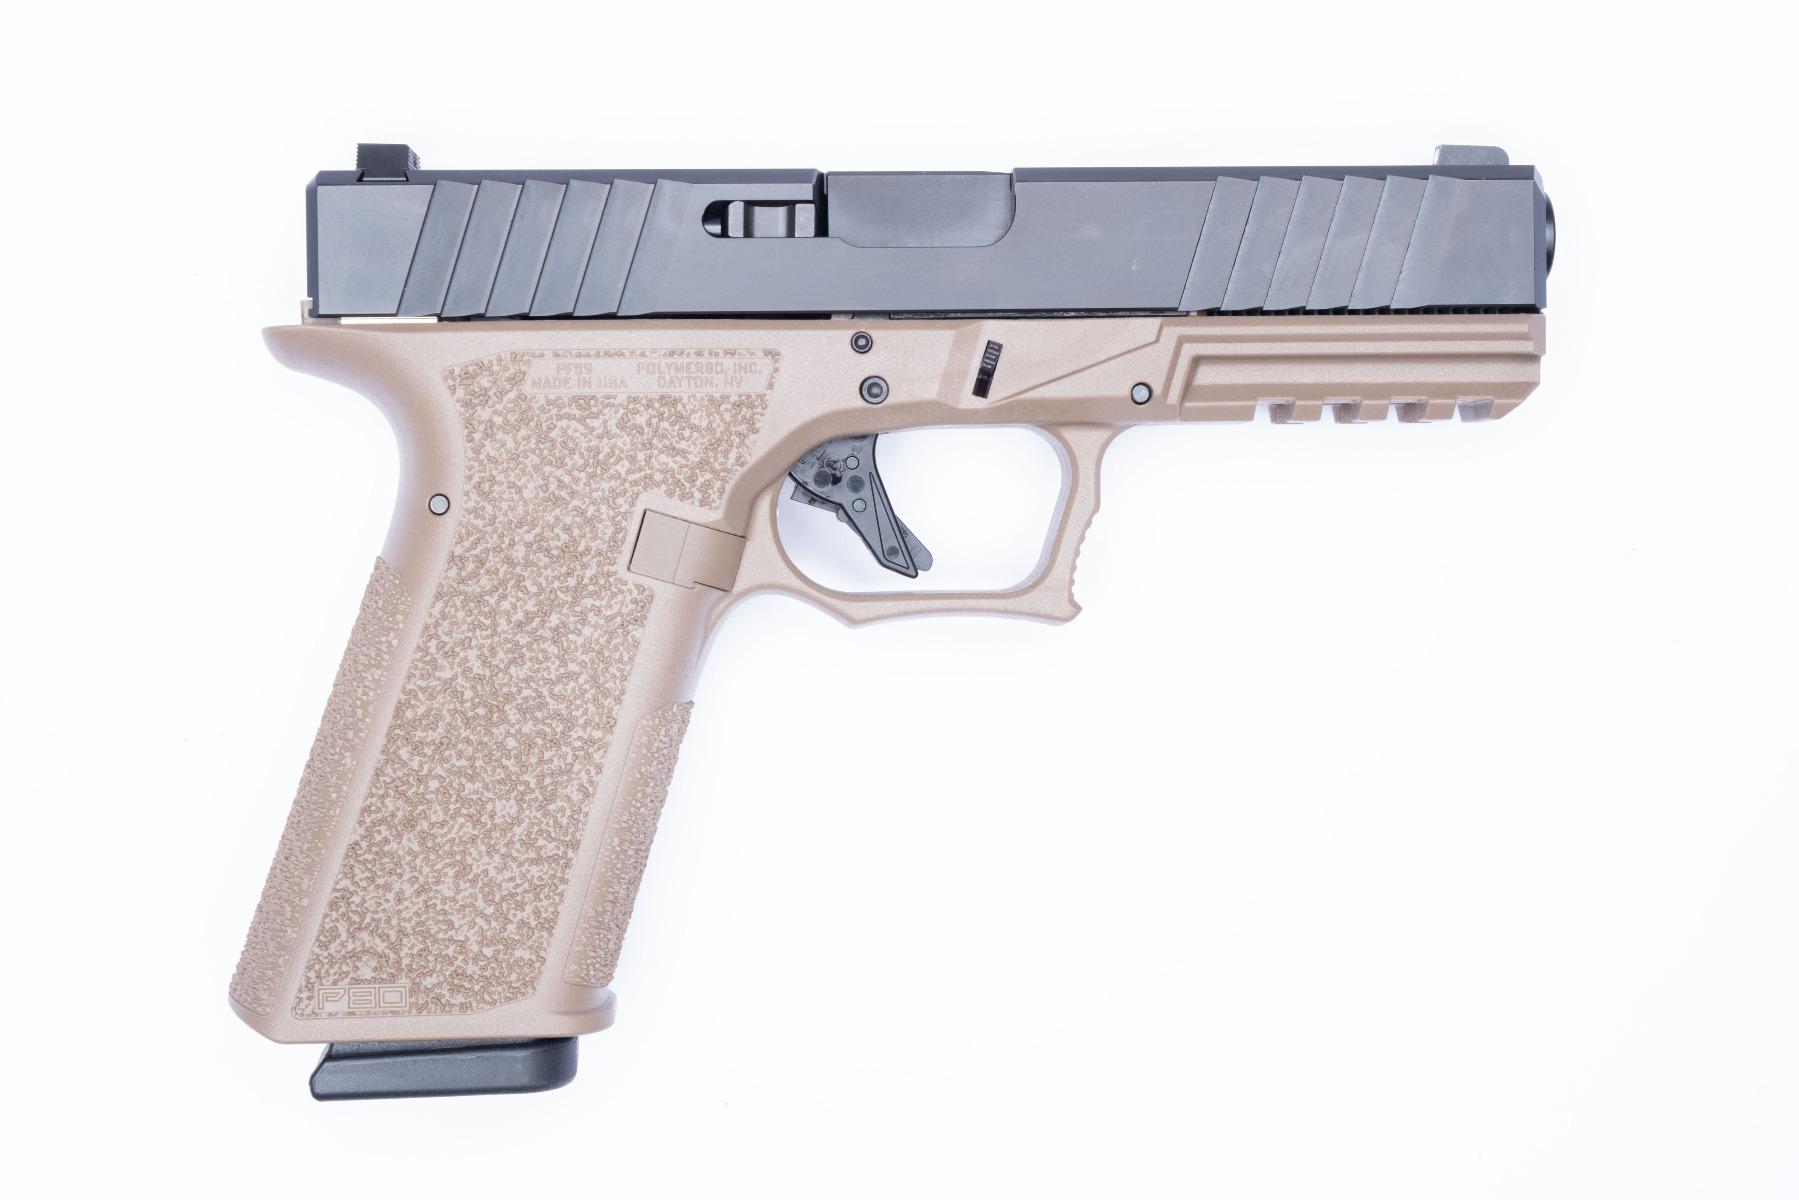 Polymer80 80% Glock 26/27 - PF940SC (Textured Grip) - Pistol